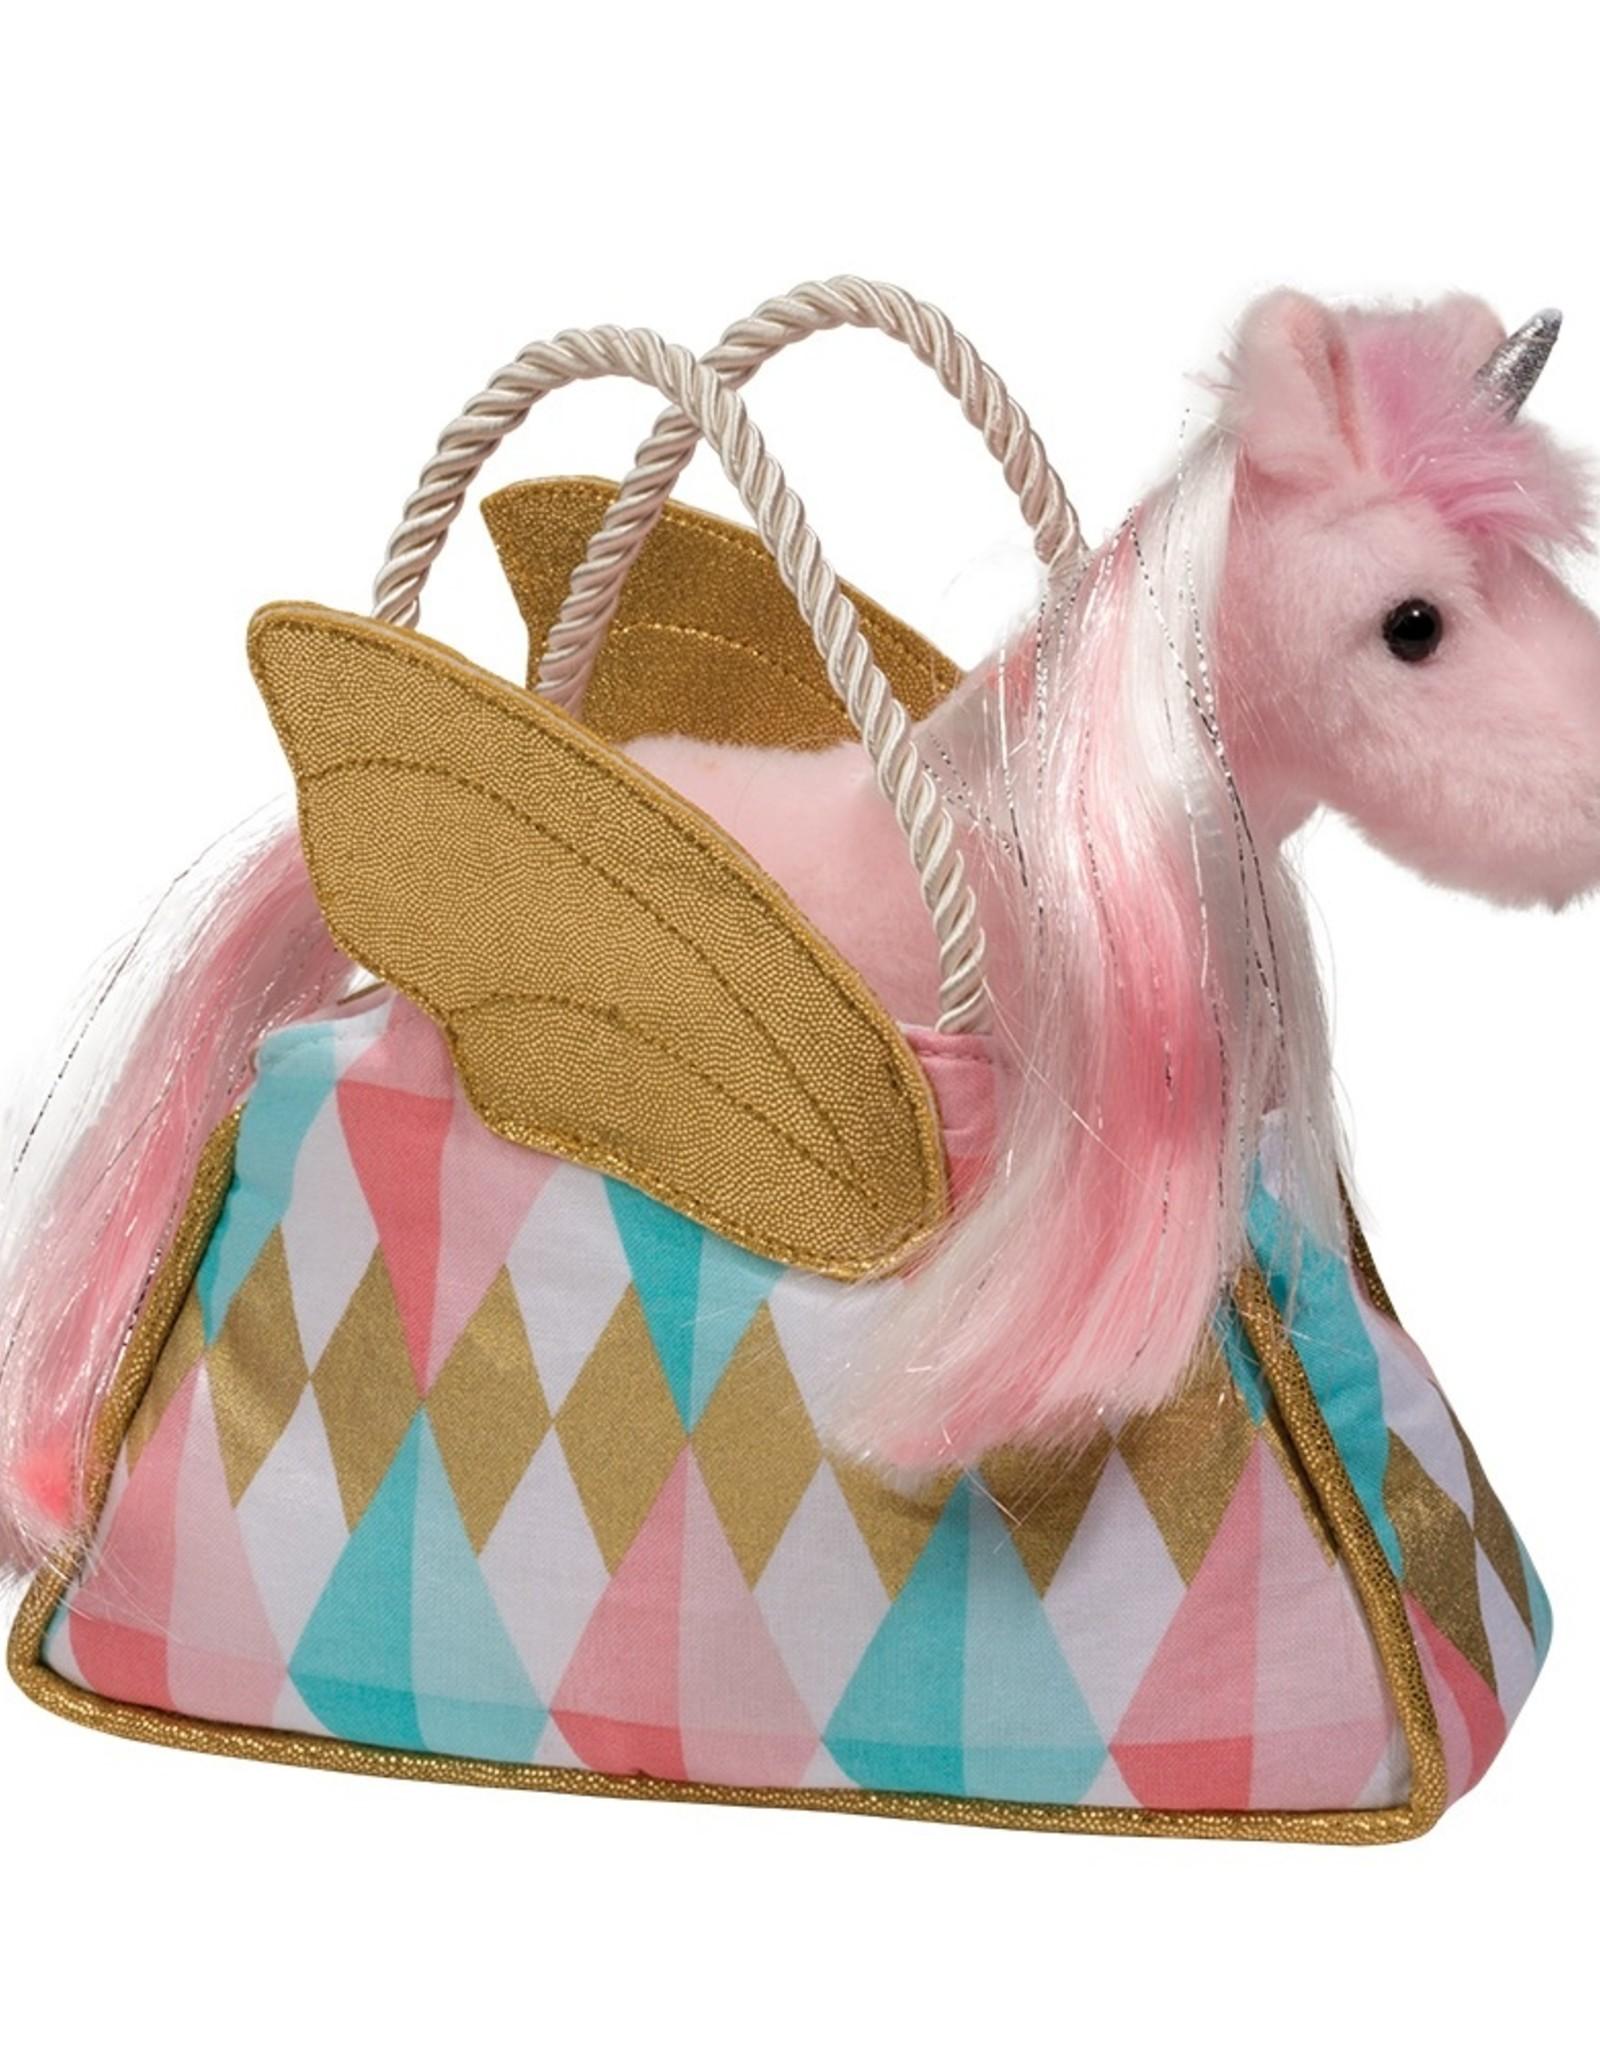 Douglas Douglas - Glitter Fancy Sak with Pink Unicorn